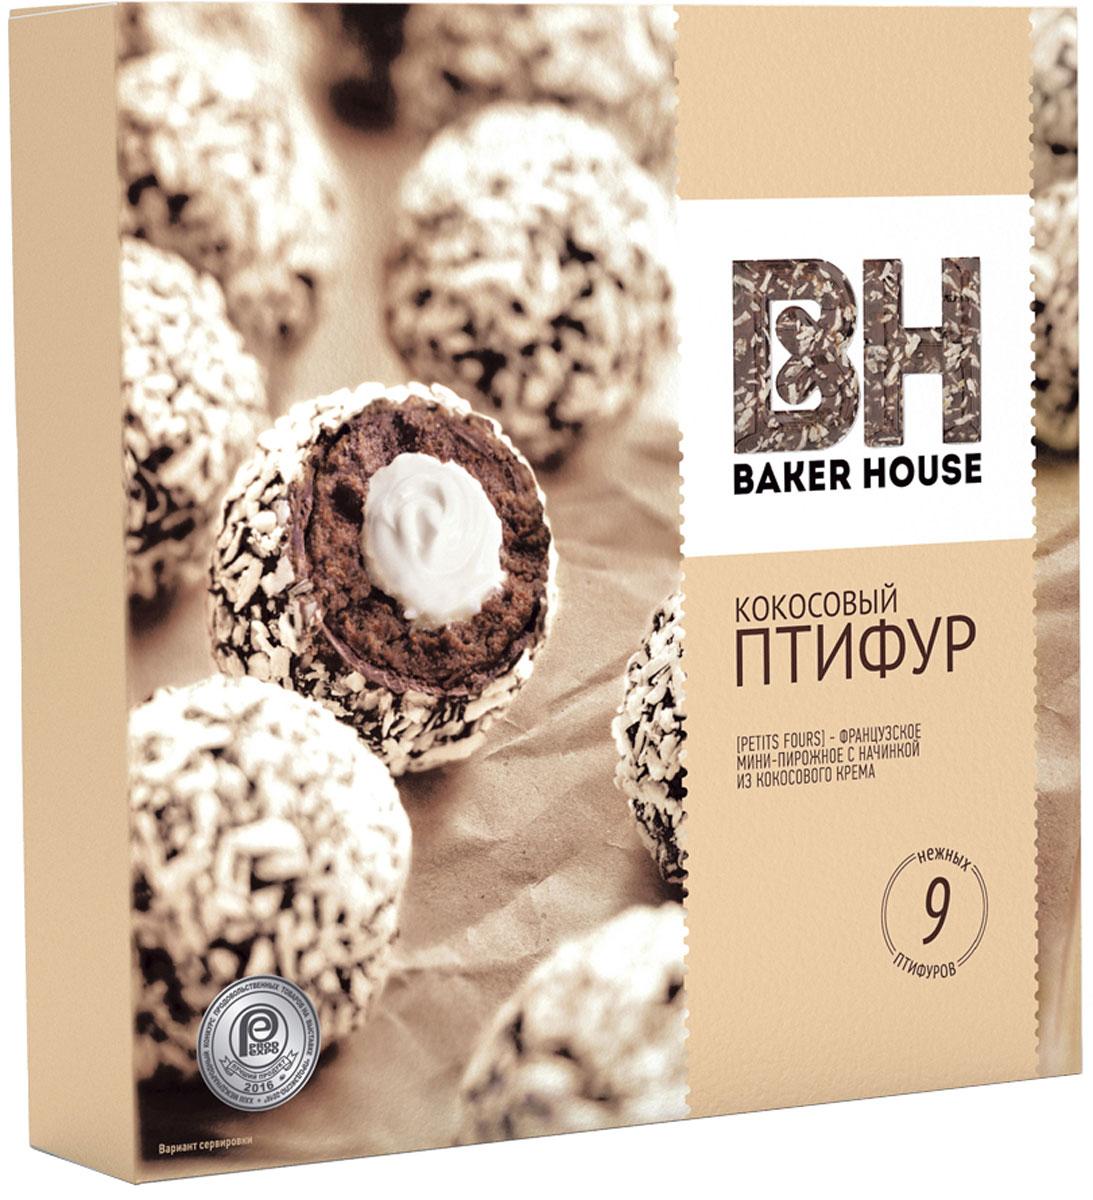 Baker House Птифур пирожные с кокосовым кремом, 225 г baker house птифур пирожные карамель с арахисом 225 г